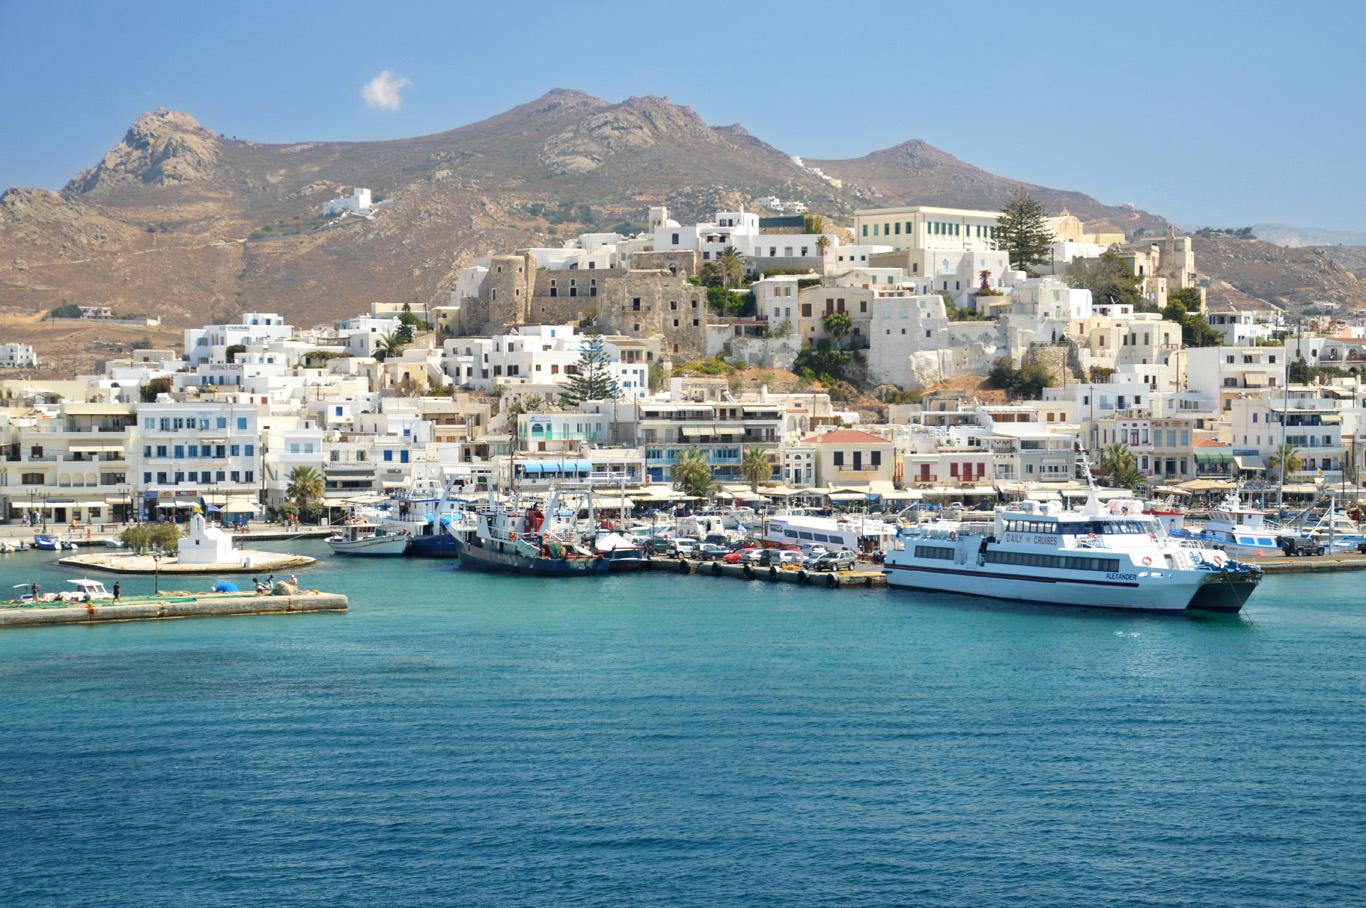 The island of Naxos on the way to Santorini